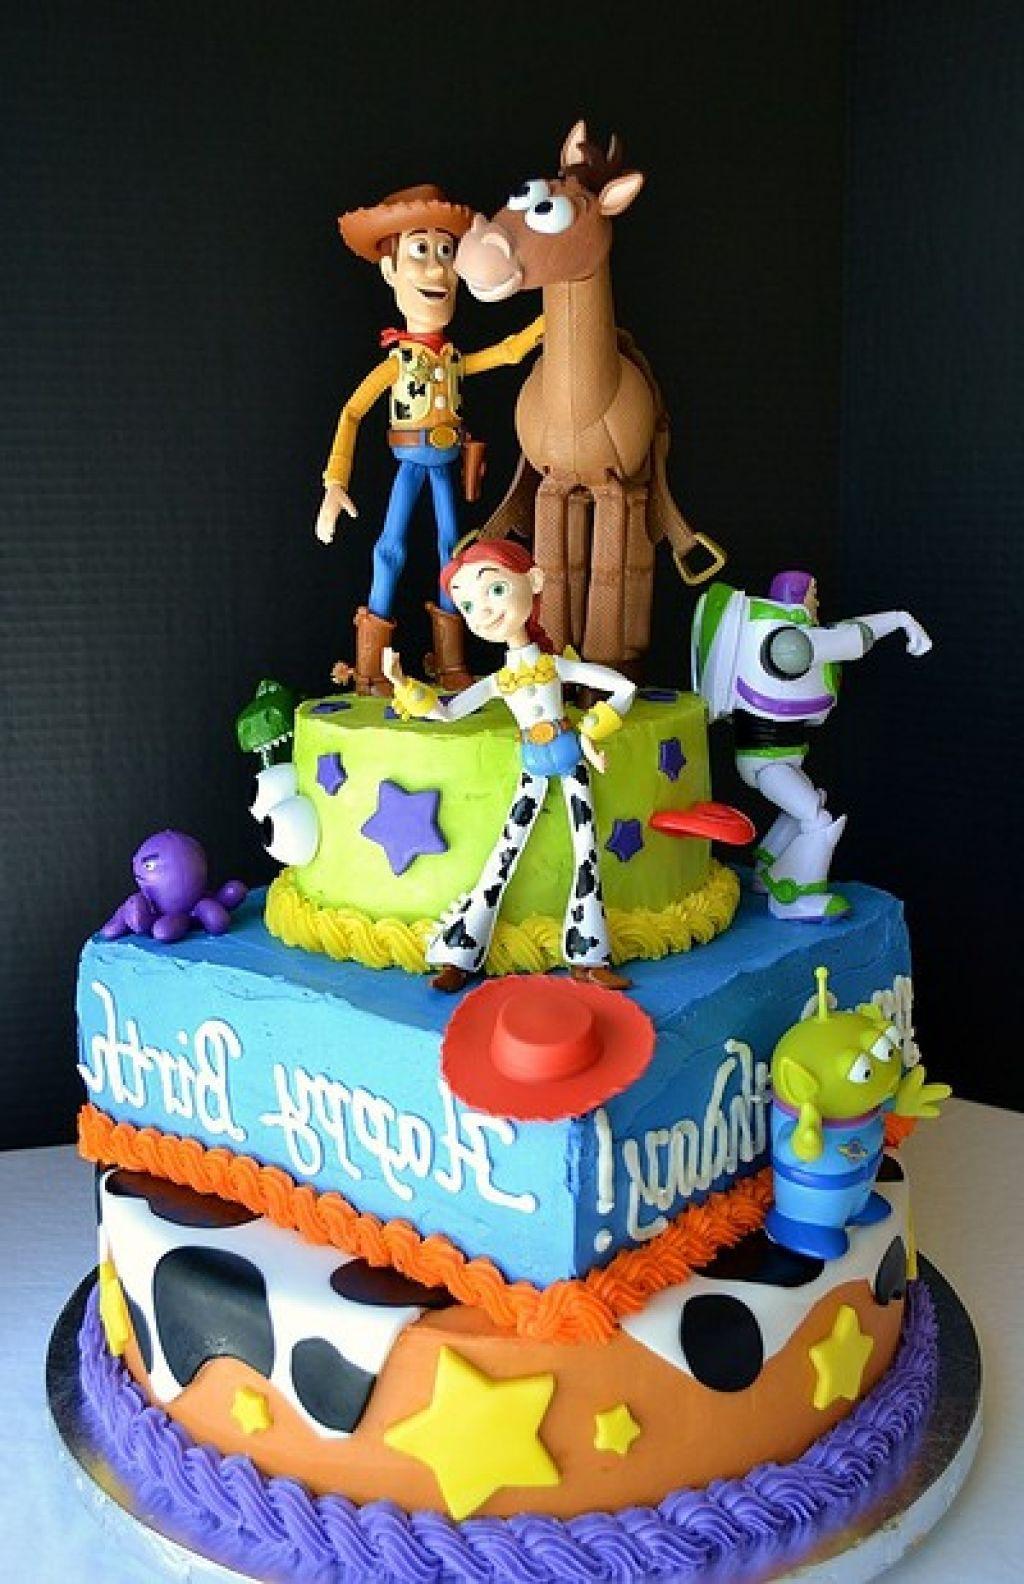 Wondrous Toy Story Cakes At Walmart Ny Super Foods Toy Story Birthday Birthday Cards Printable Trancafe Filternl